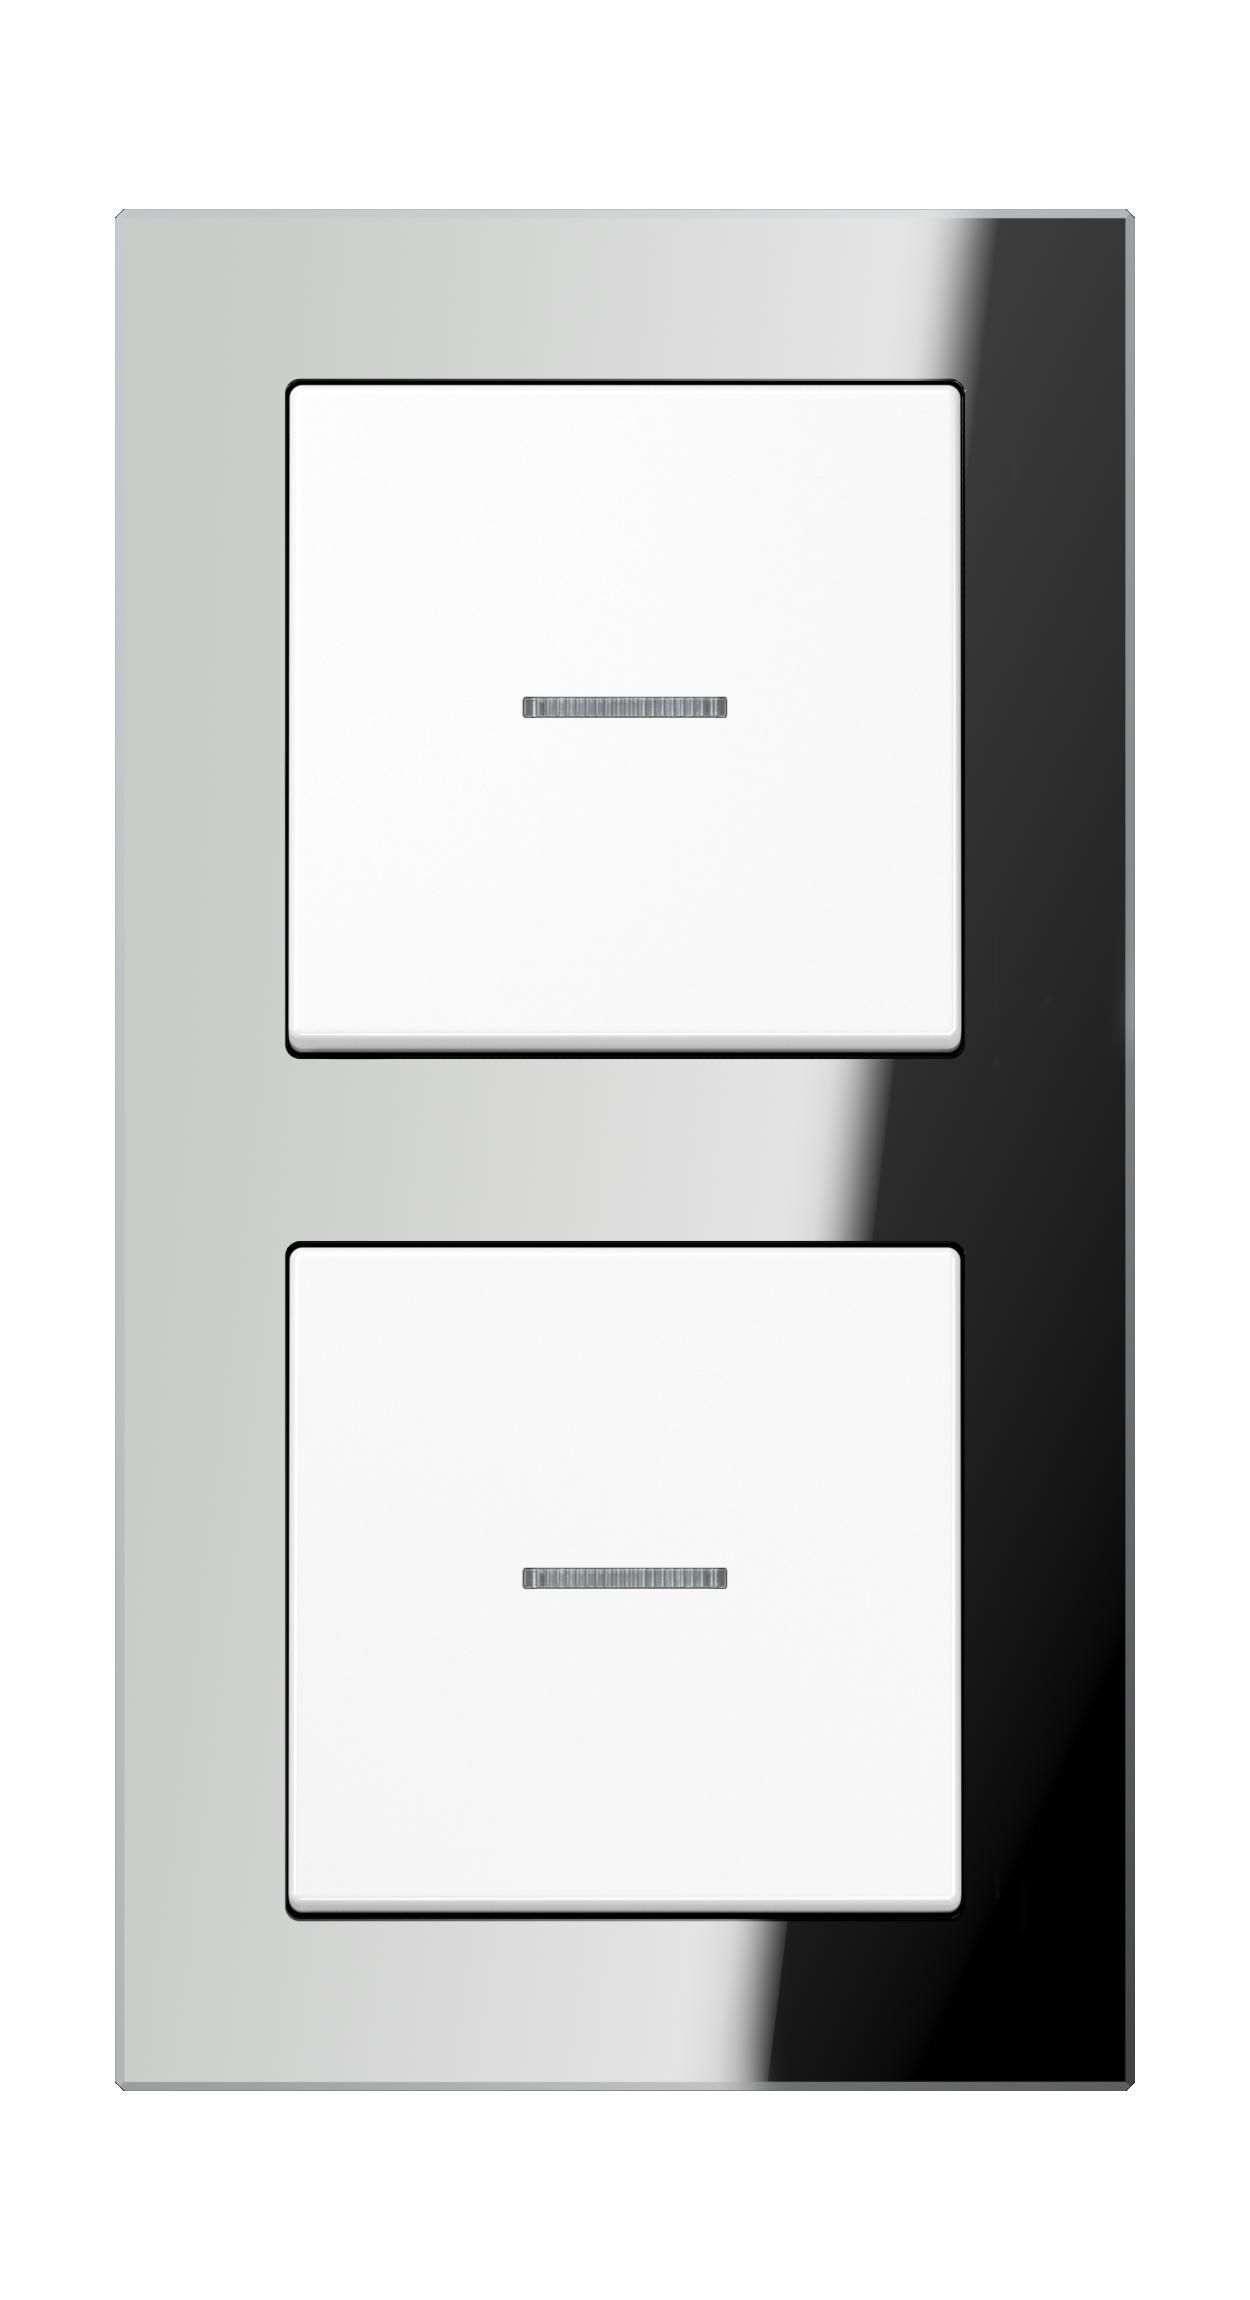 JUNG_AC_GL_silver_white_switch-lense_switch-lense